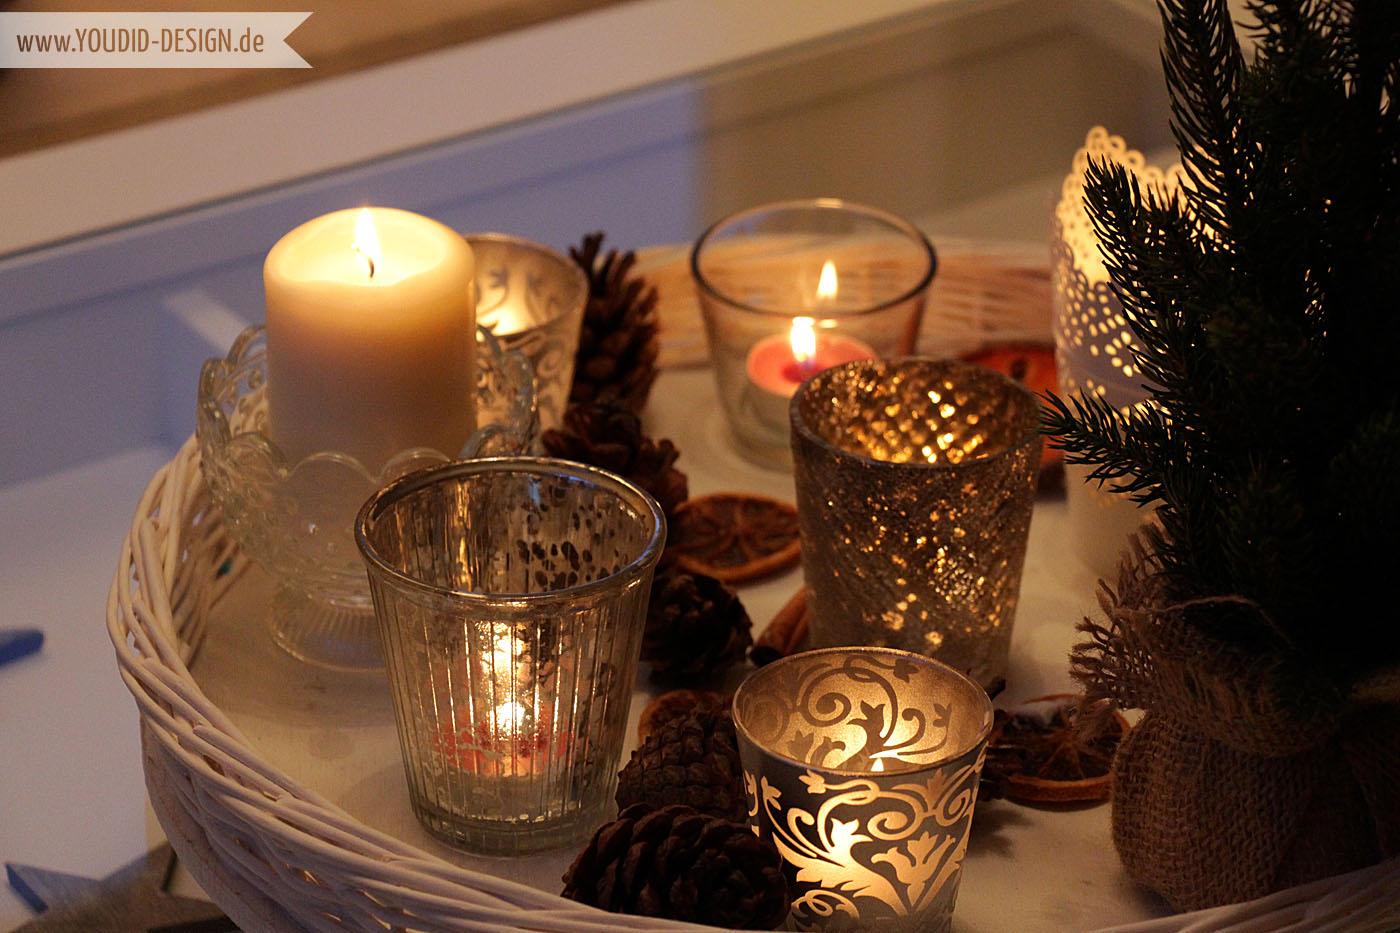 Christmasdecoration | www.youdid-design.de